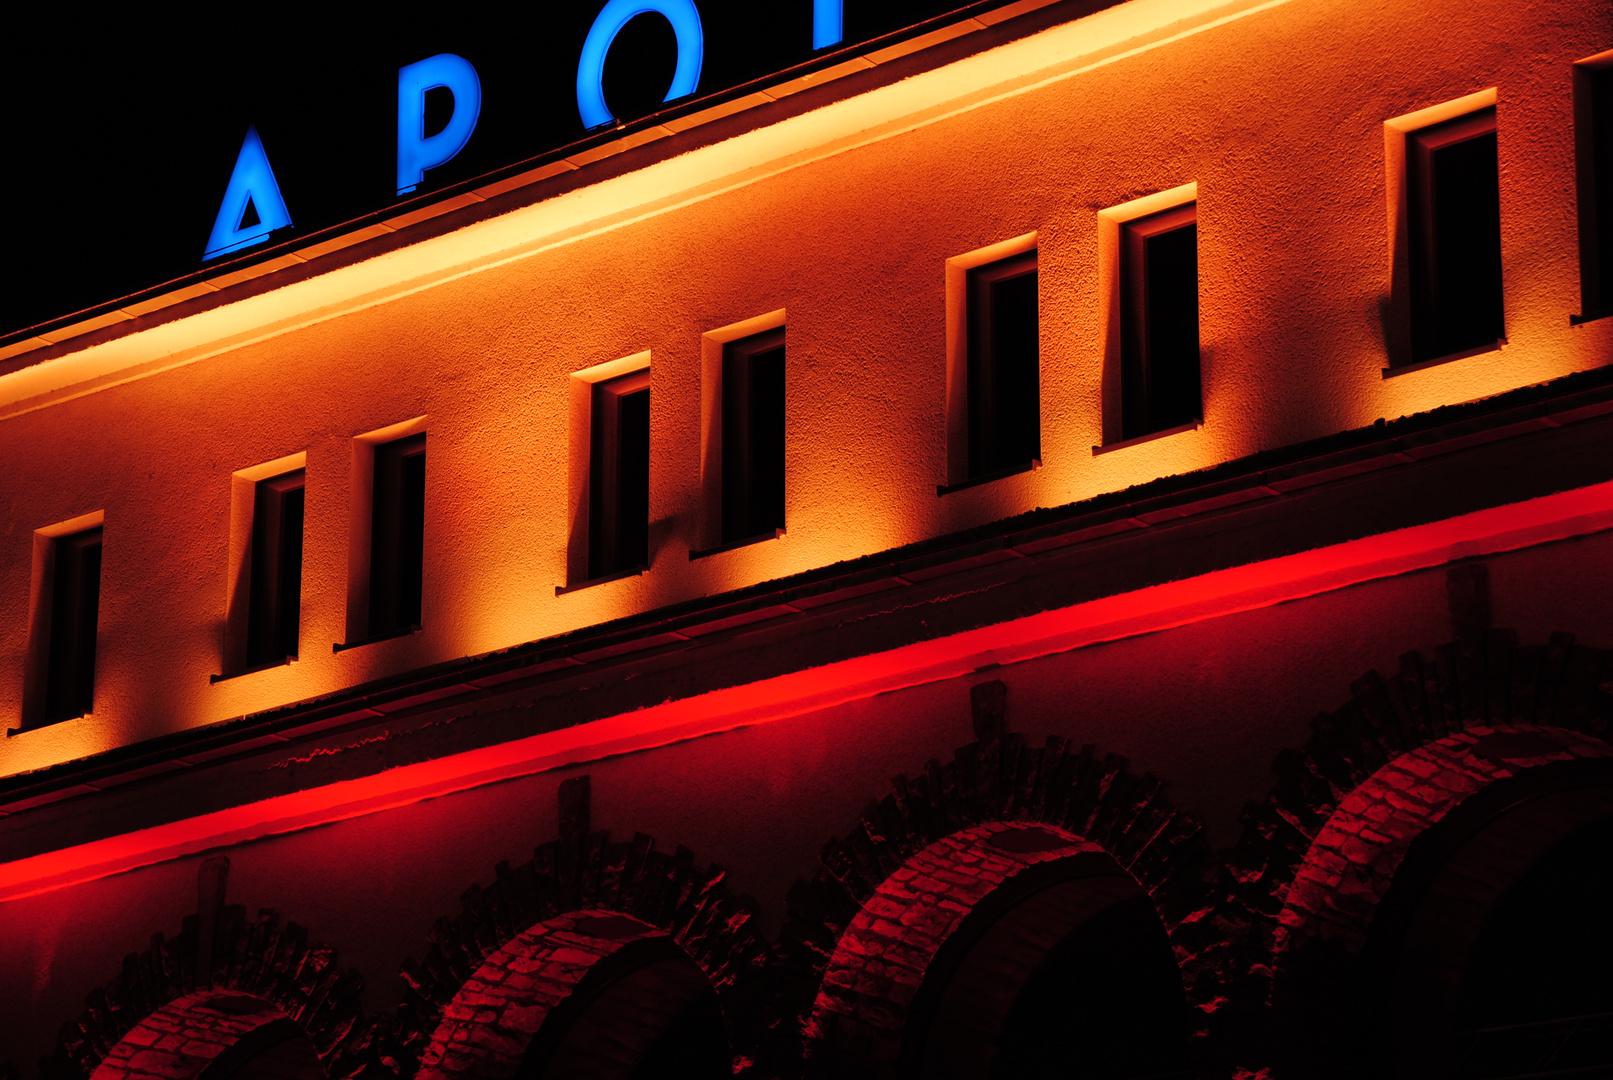 Apollotheater